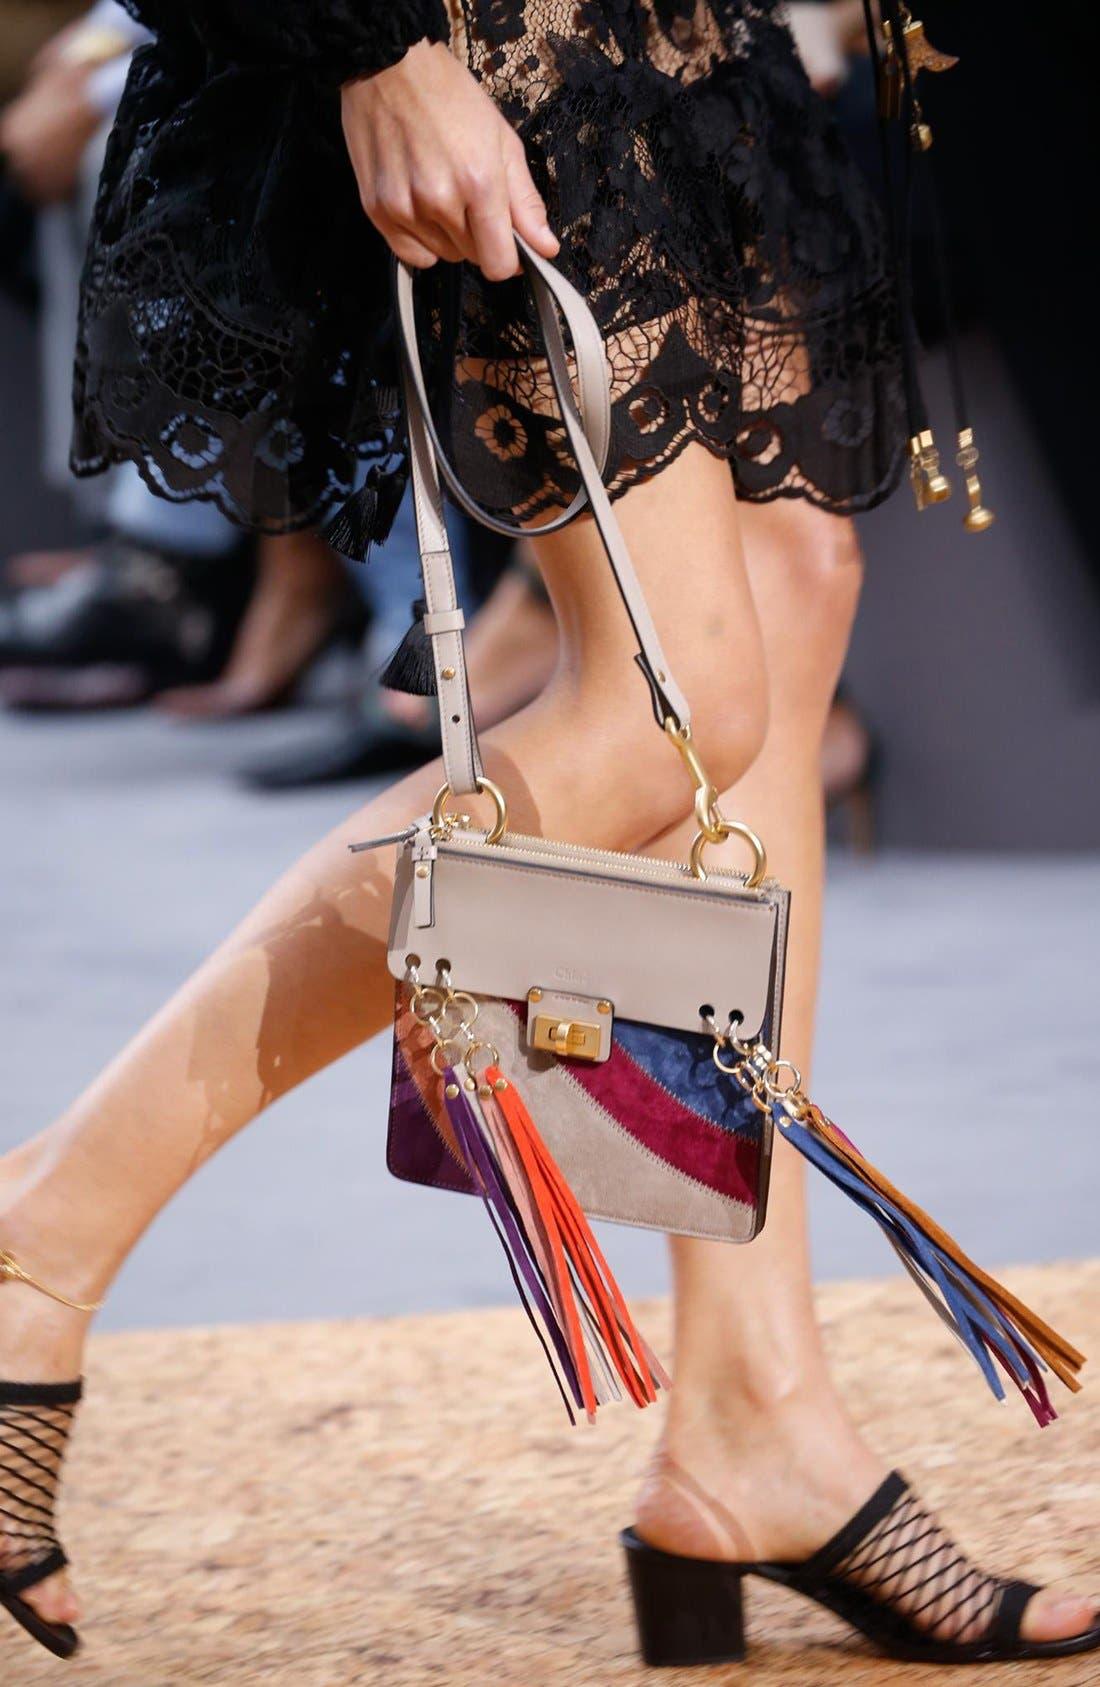 Alternate Image 2  - Chloé 'Small Jane' Suede Fringe Patchwork Leather Crossbody Bag